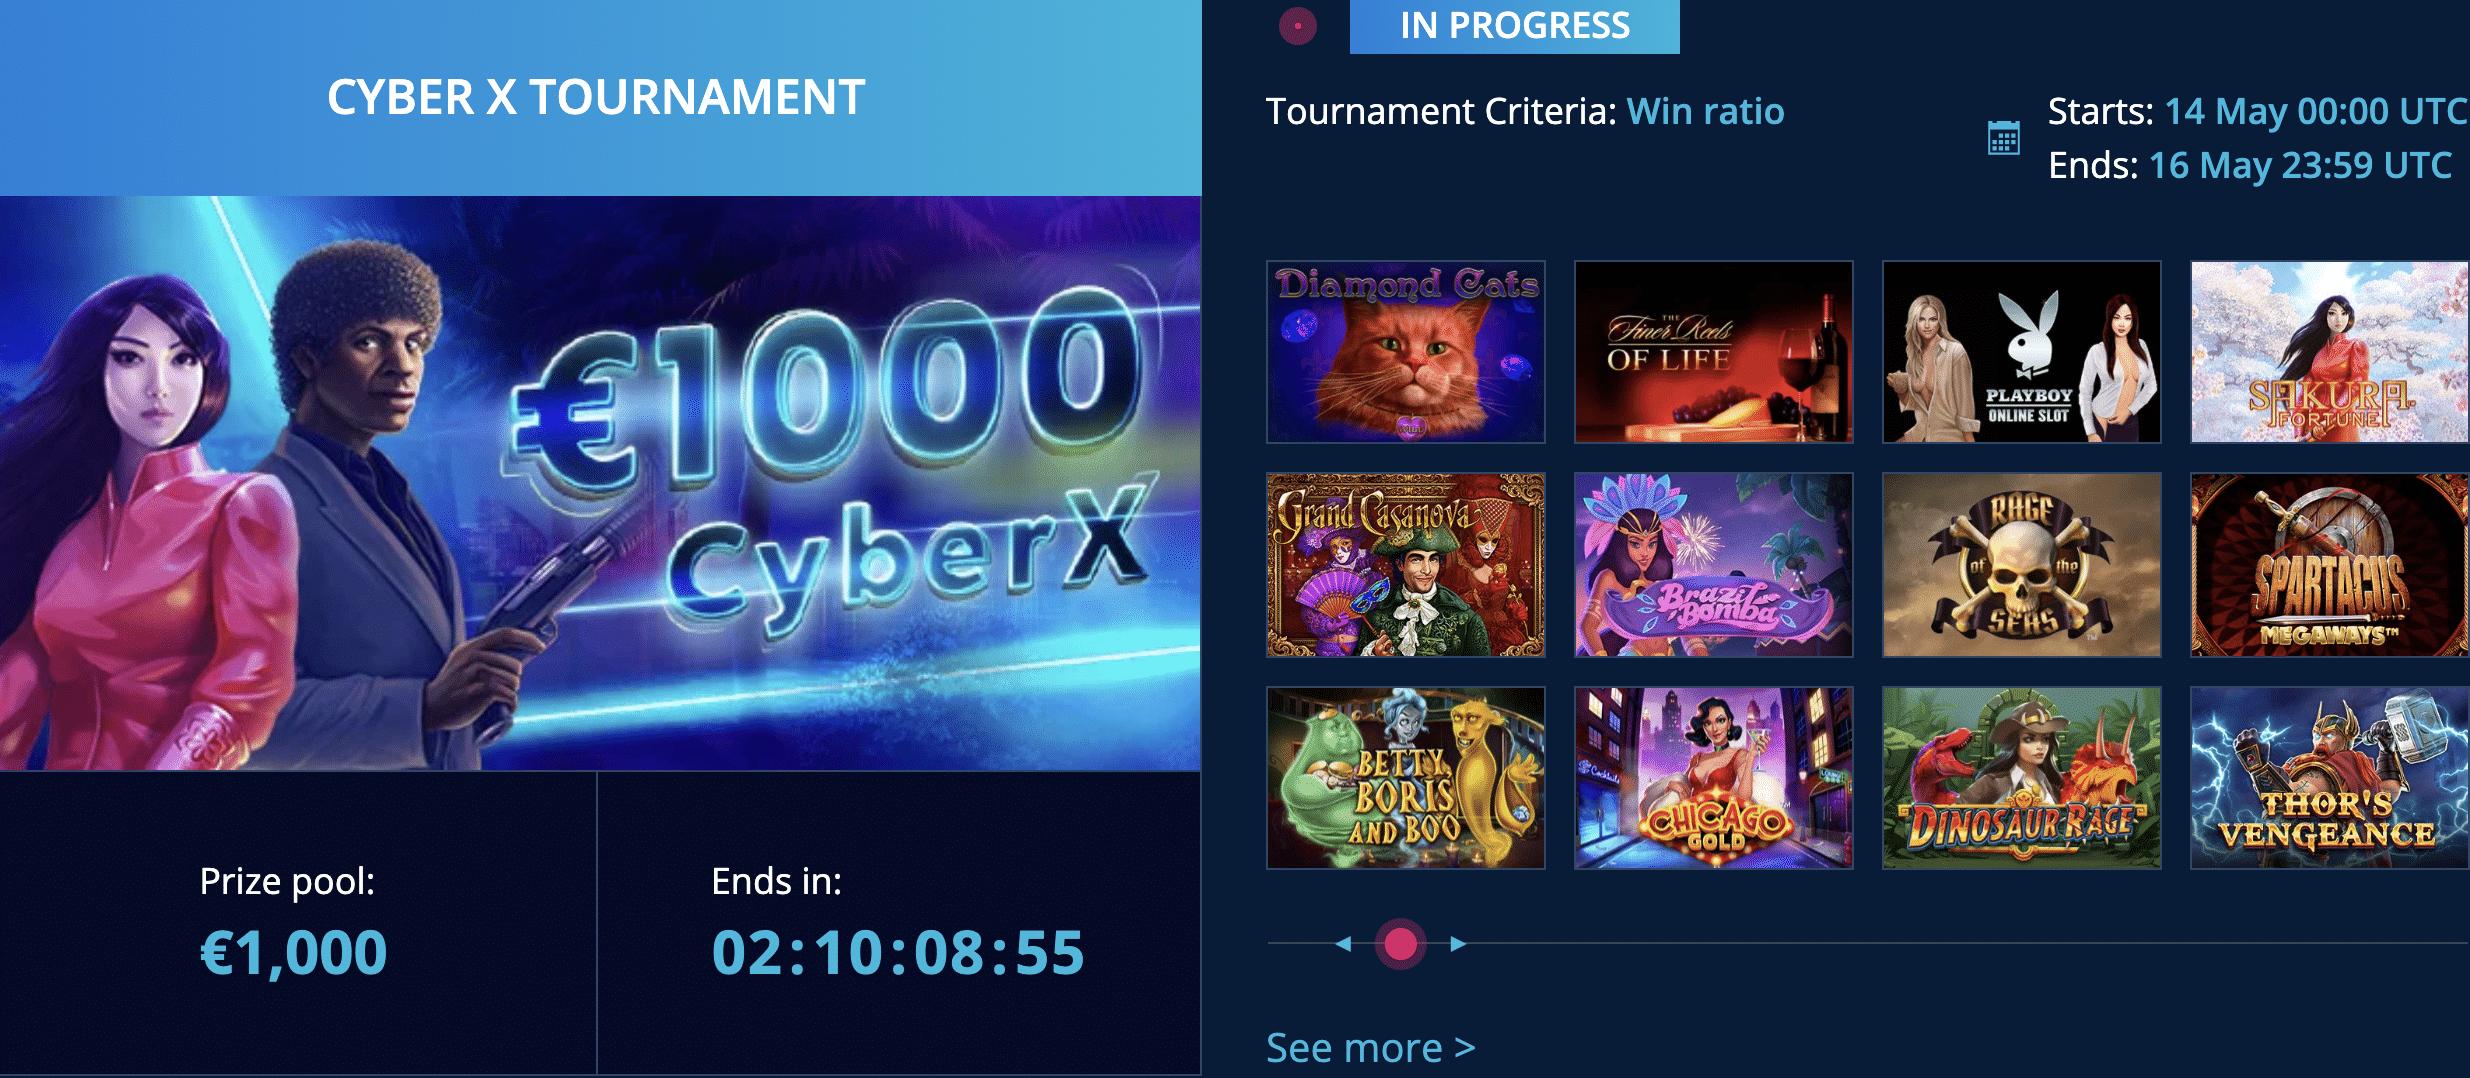 Cyber Tournament